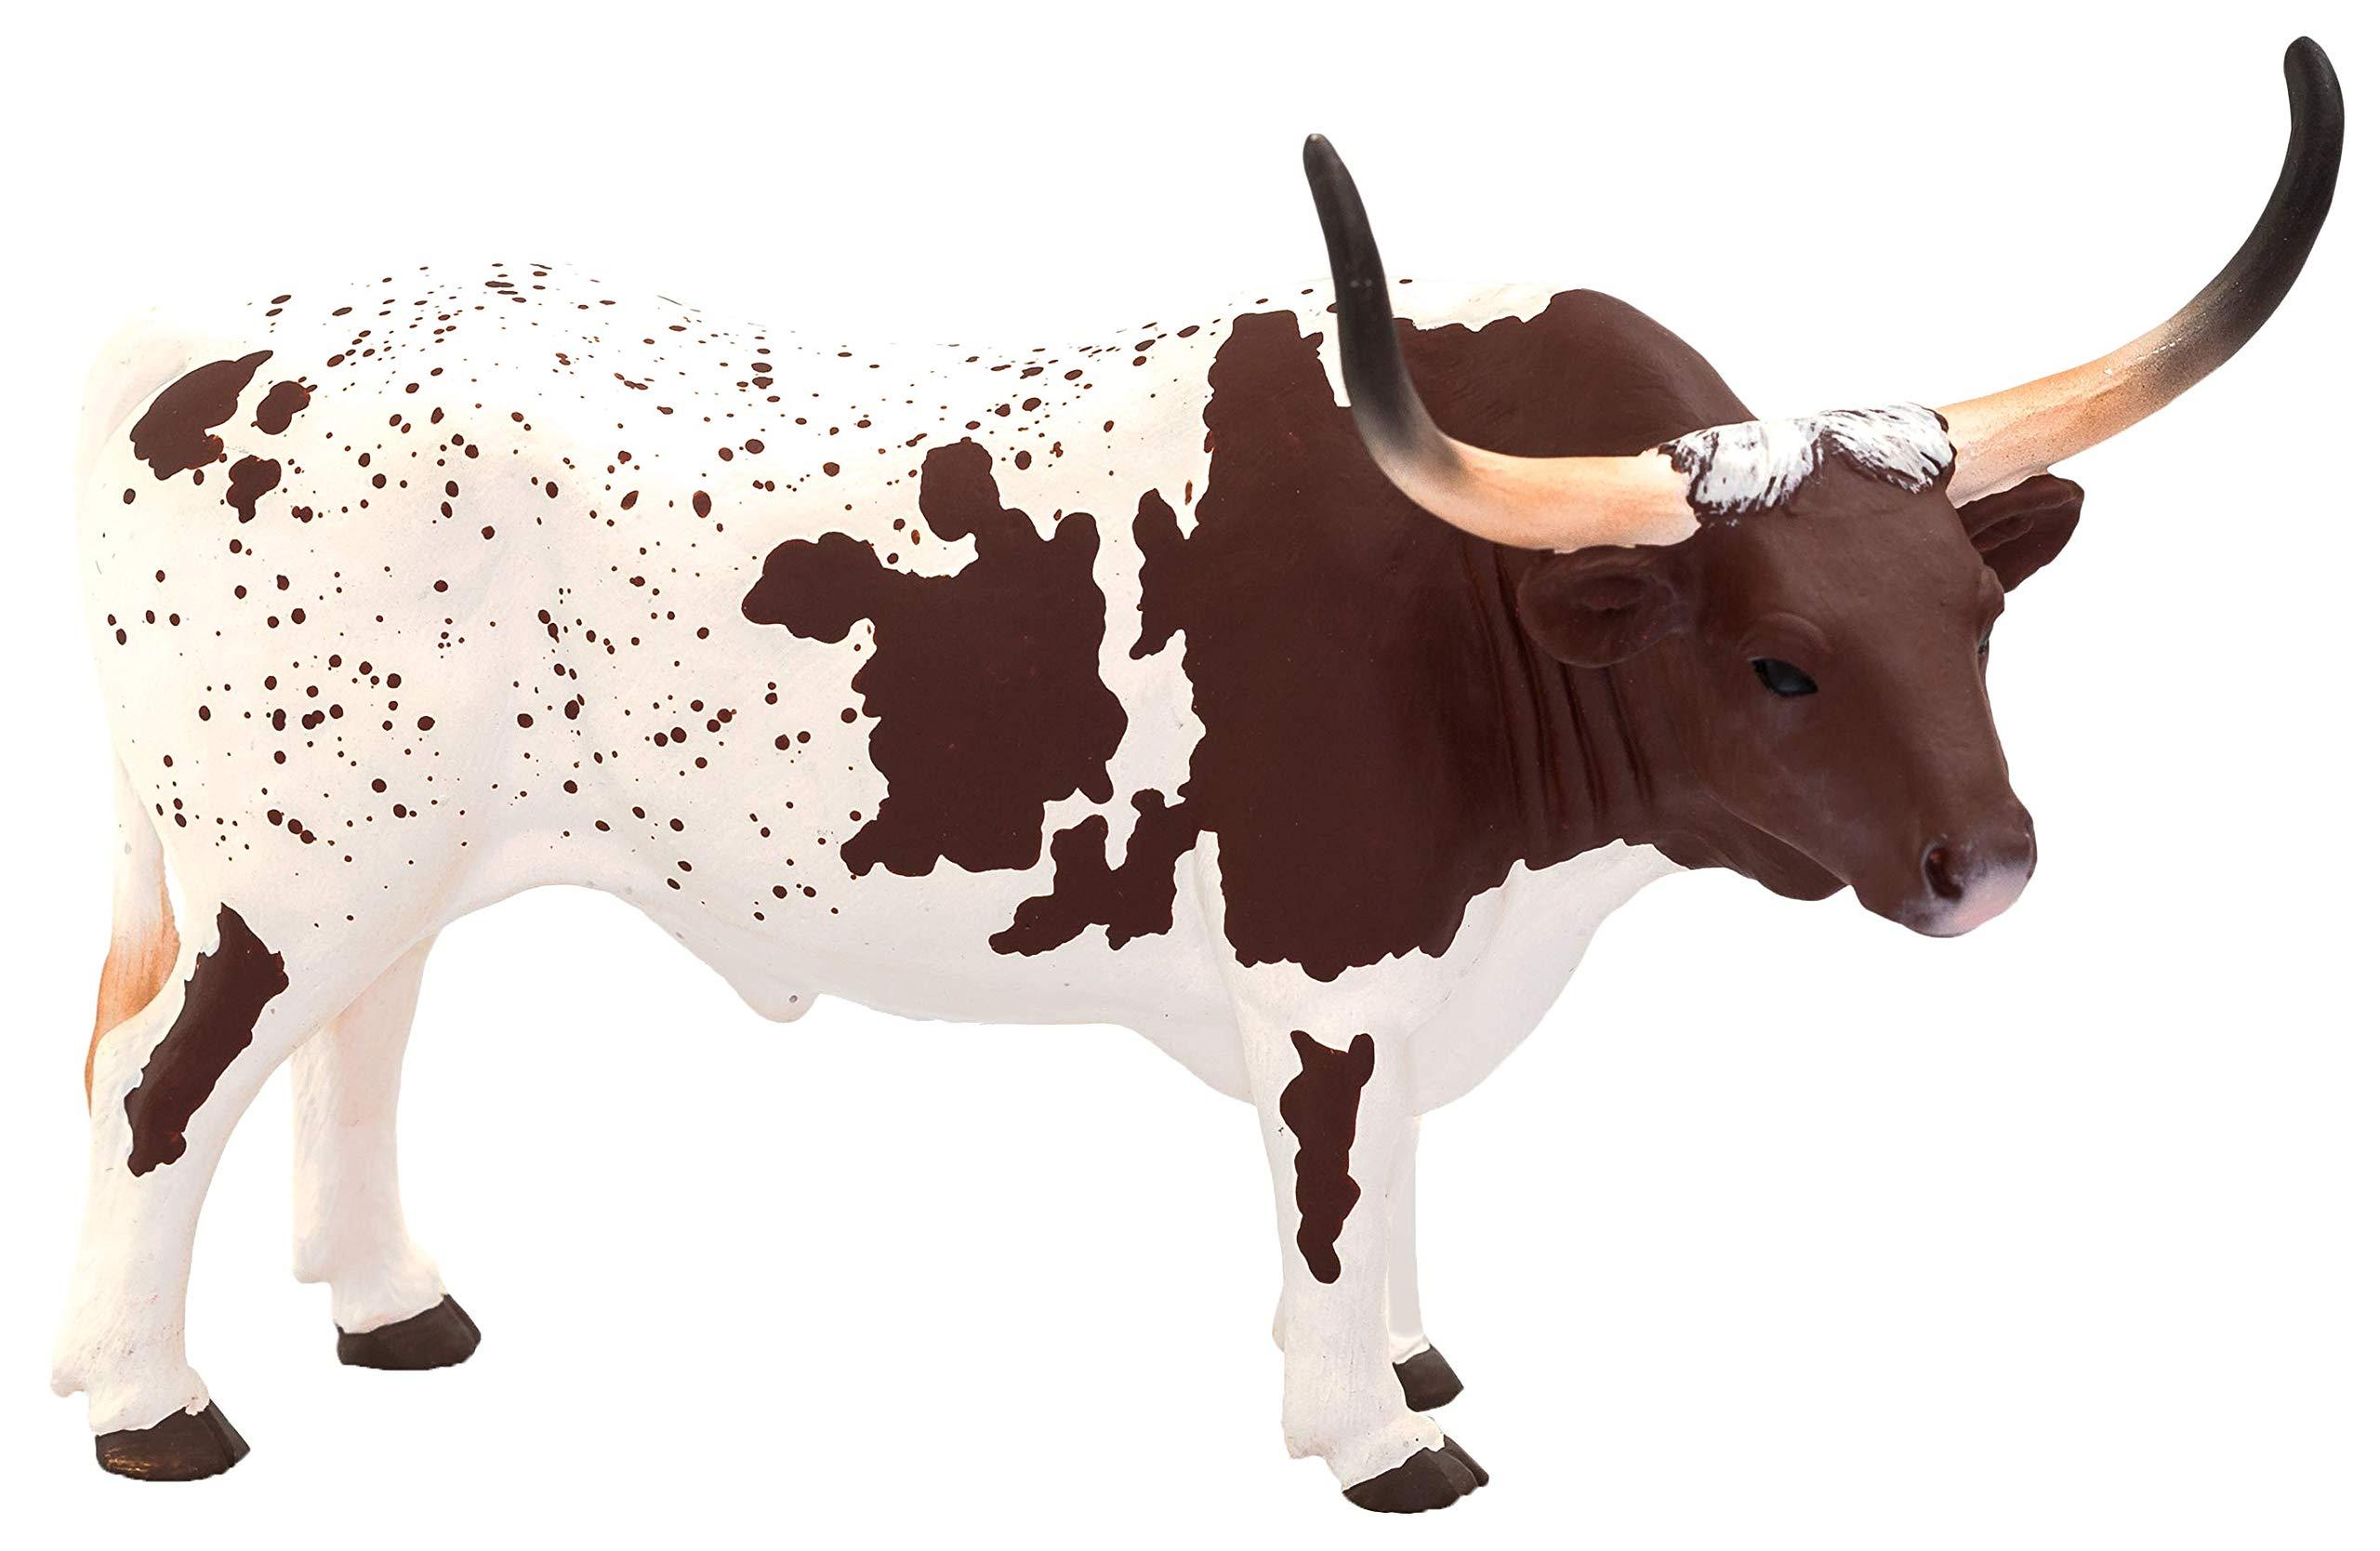 MOJO Texas Longhorn Bull Realistic Farm Animal Toy Replica Hand Painted Figurine